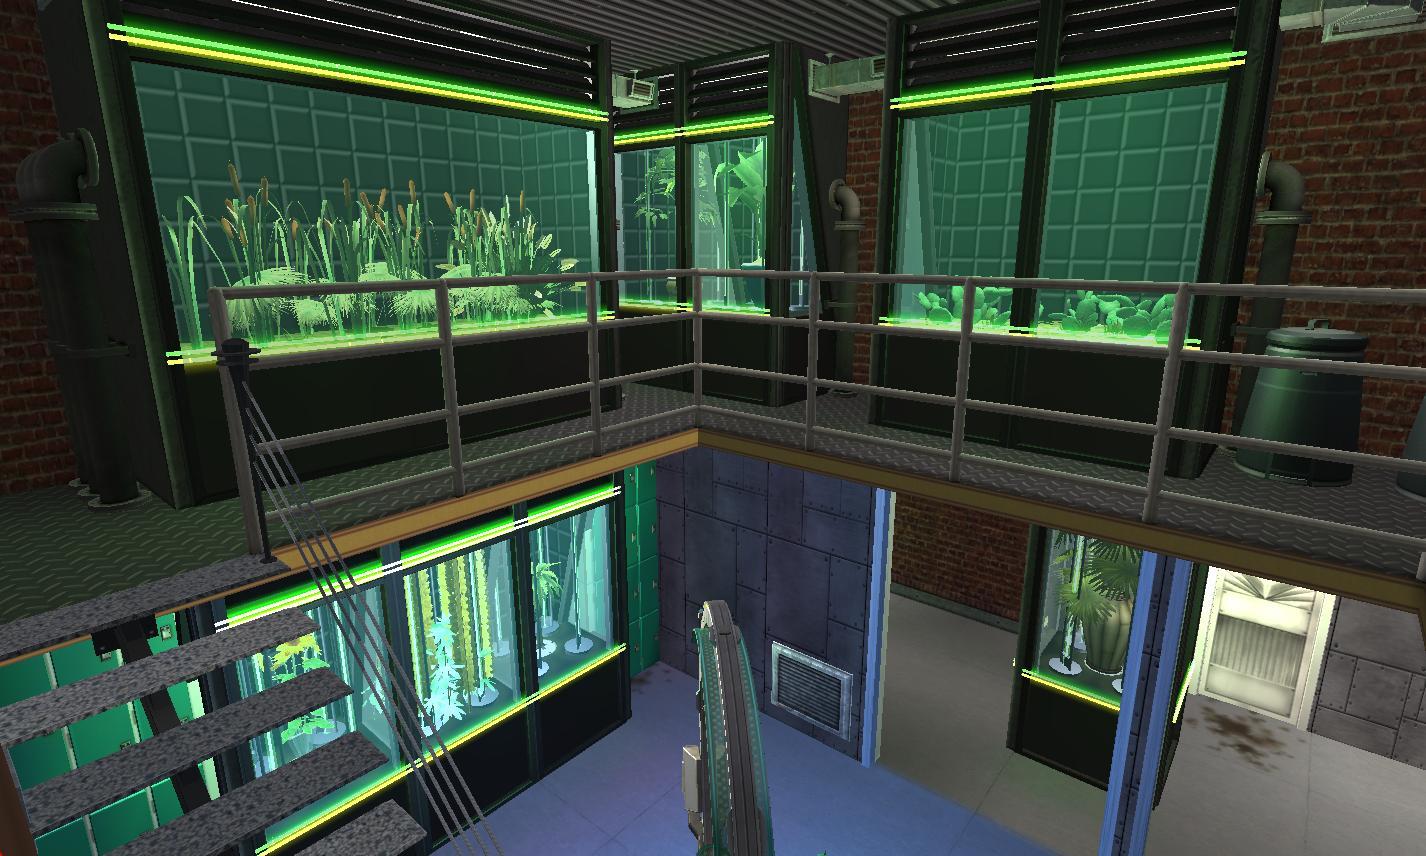 Mod The Sims - Cyberpunk Bio-Lab + Home Business - NO CC